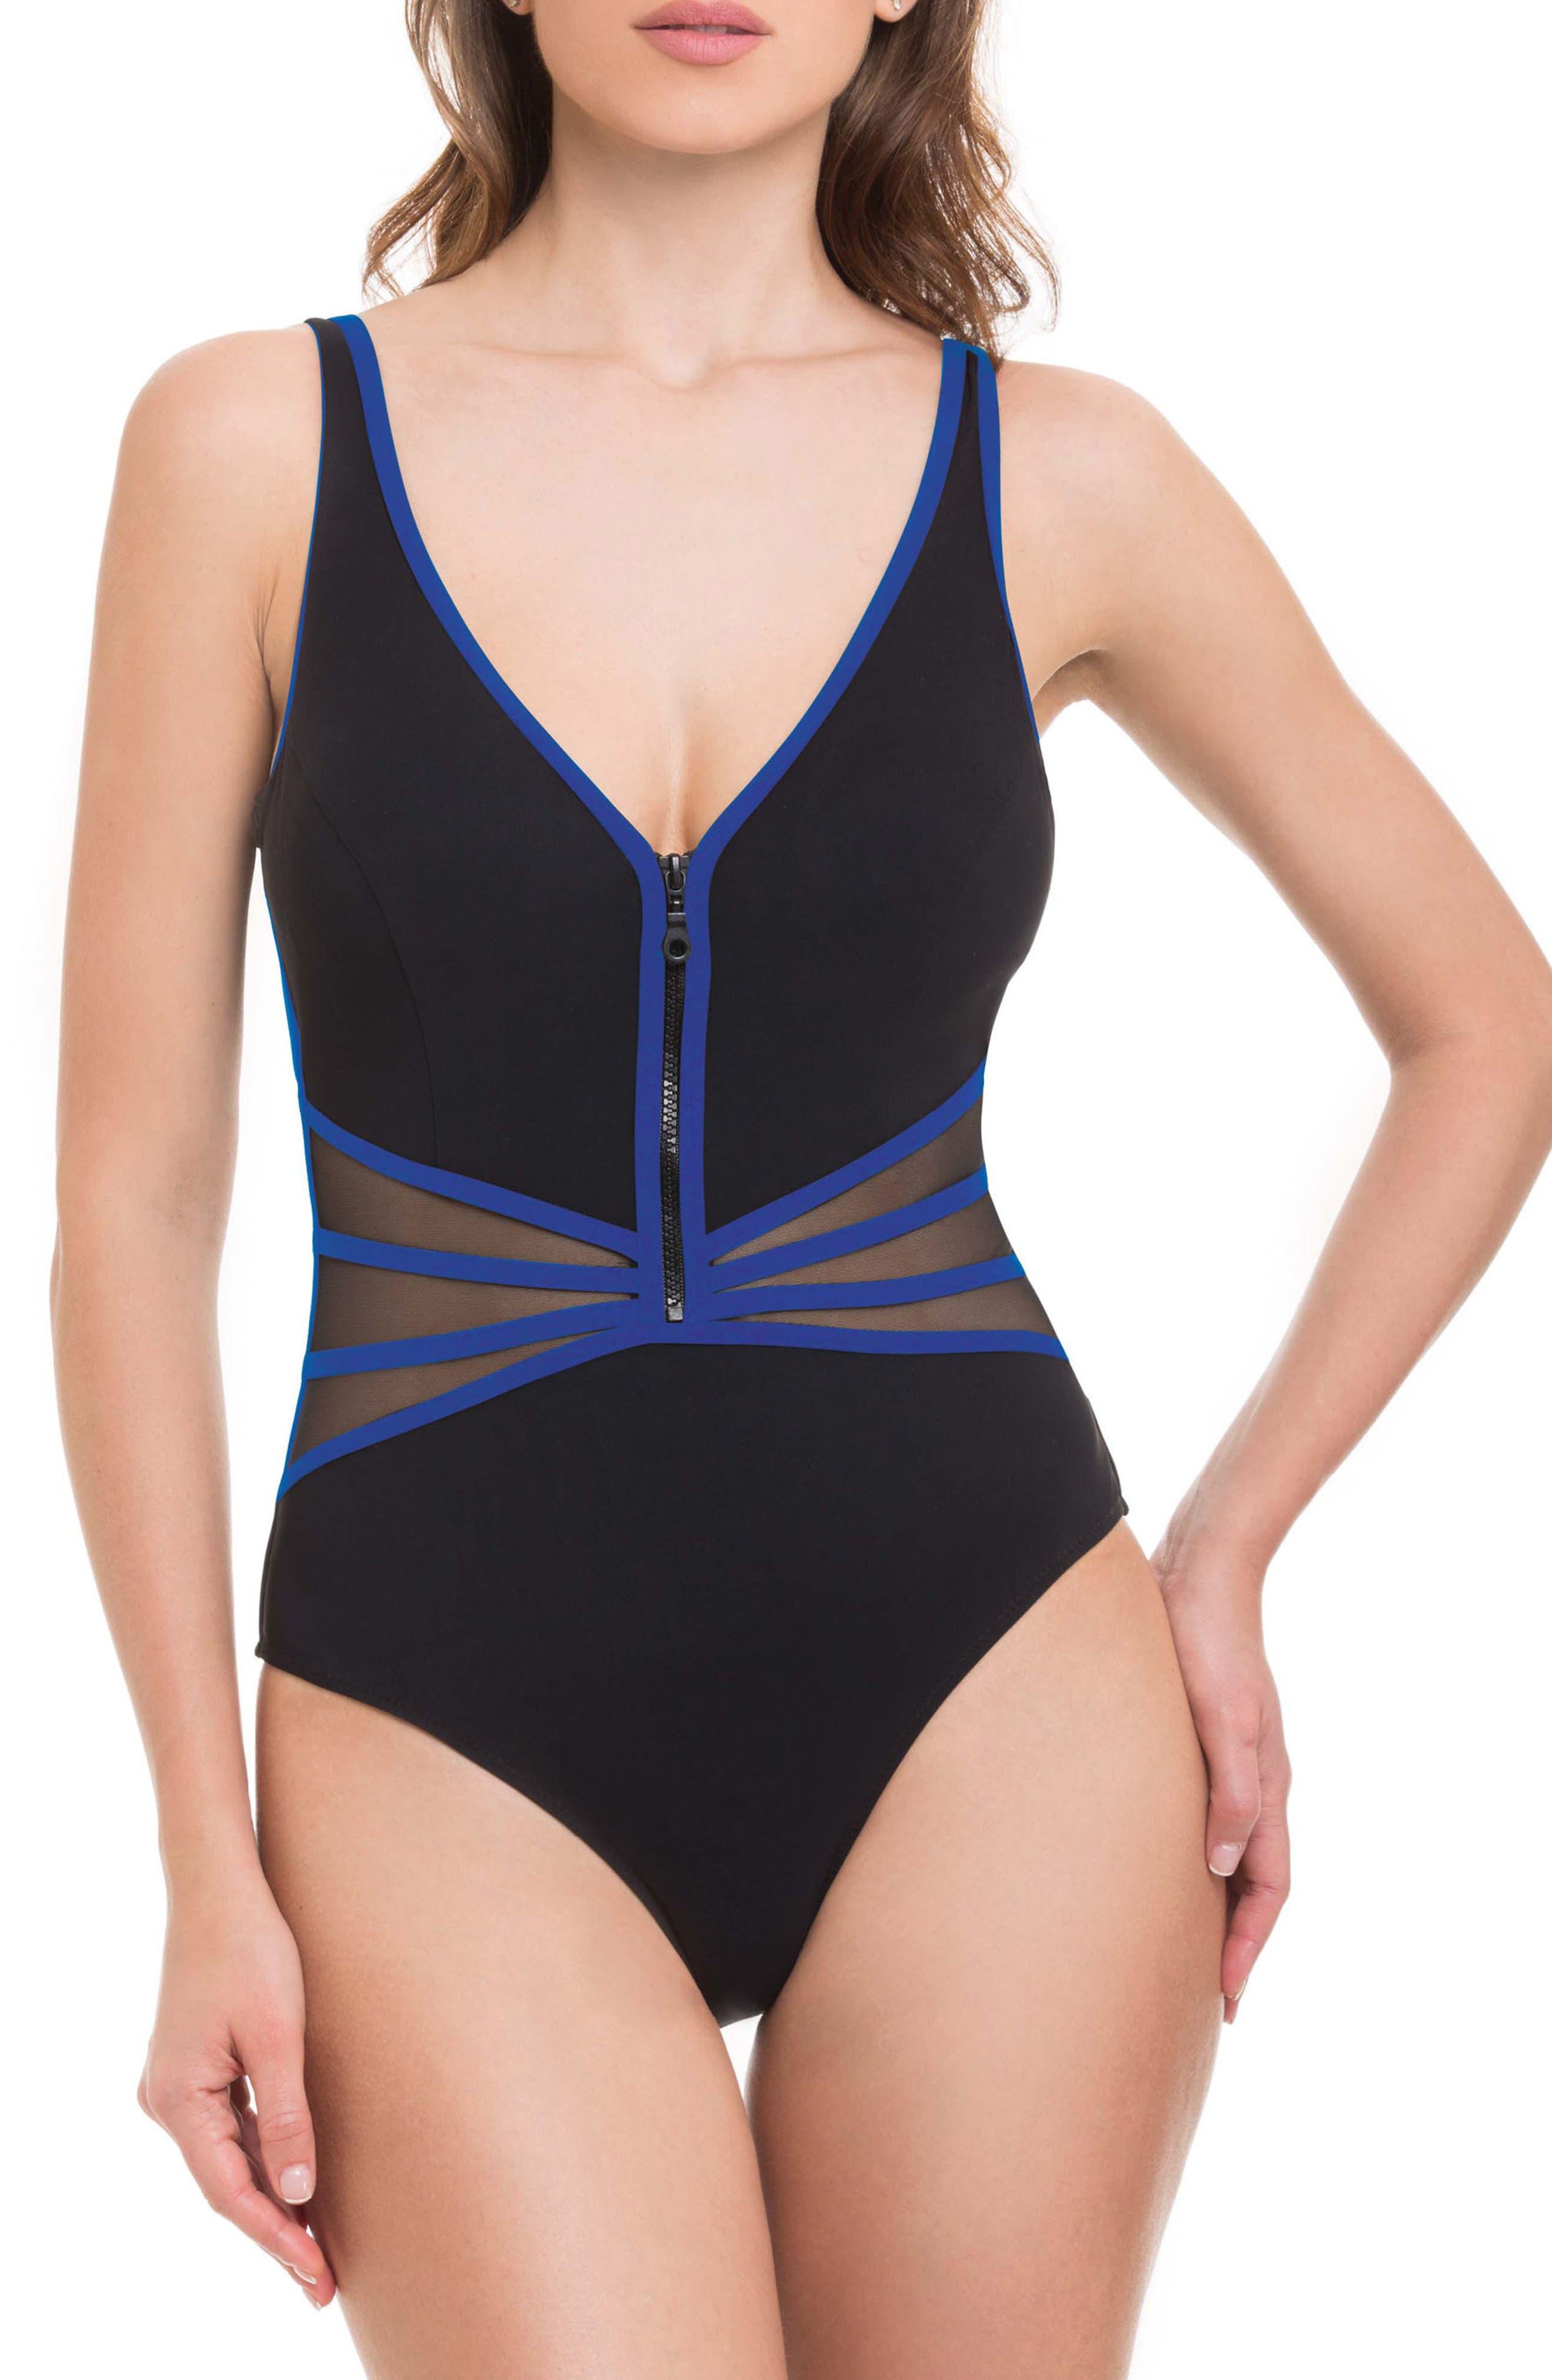 Grand Prix One-Piece Swimsuit,                         Main,                         color, 005